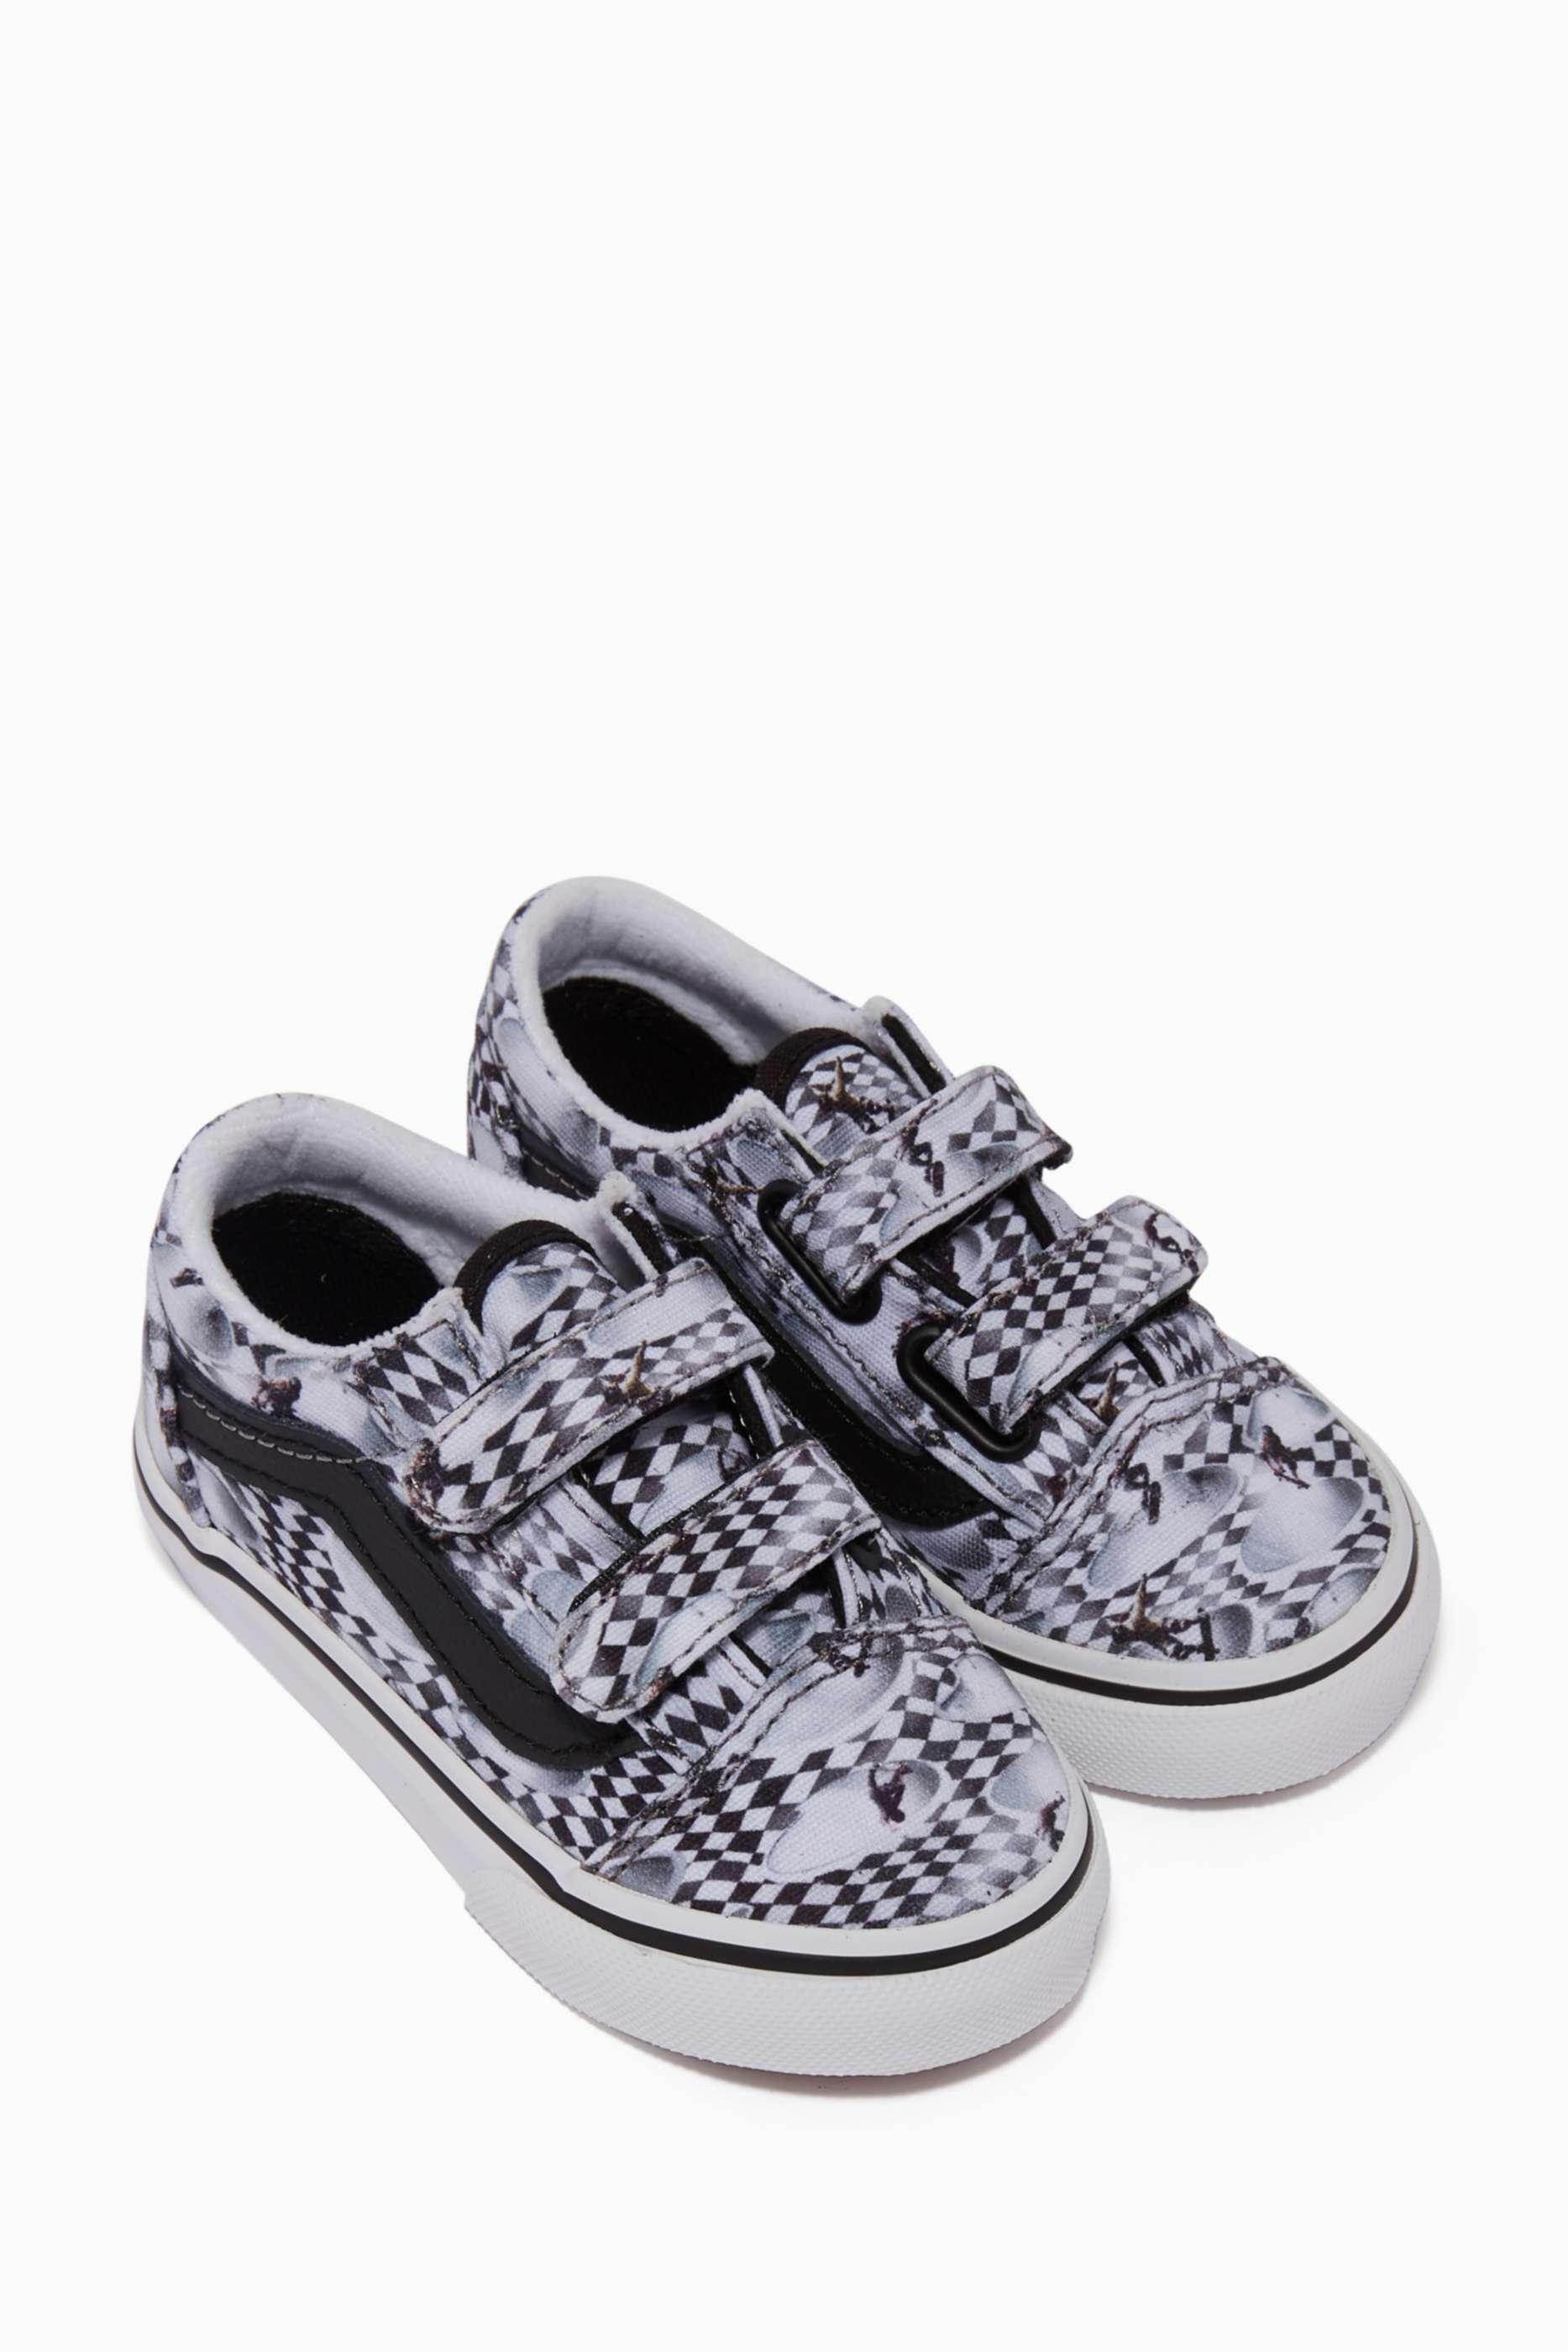 Shop Vans Multicolour X Molo Old Skool V Sneakers for Kids